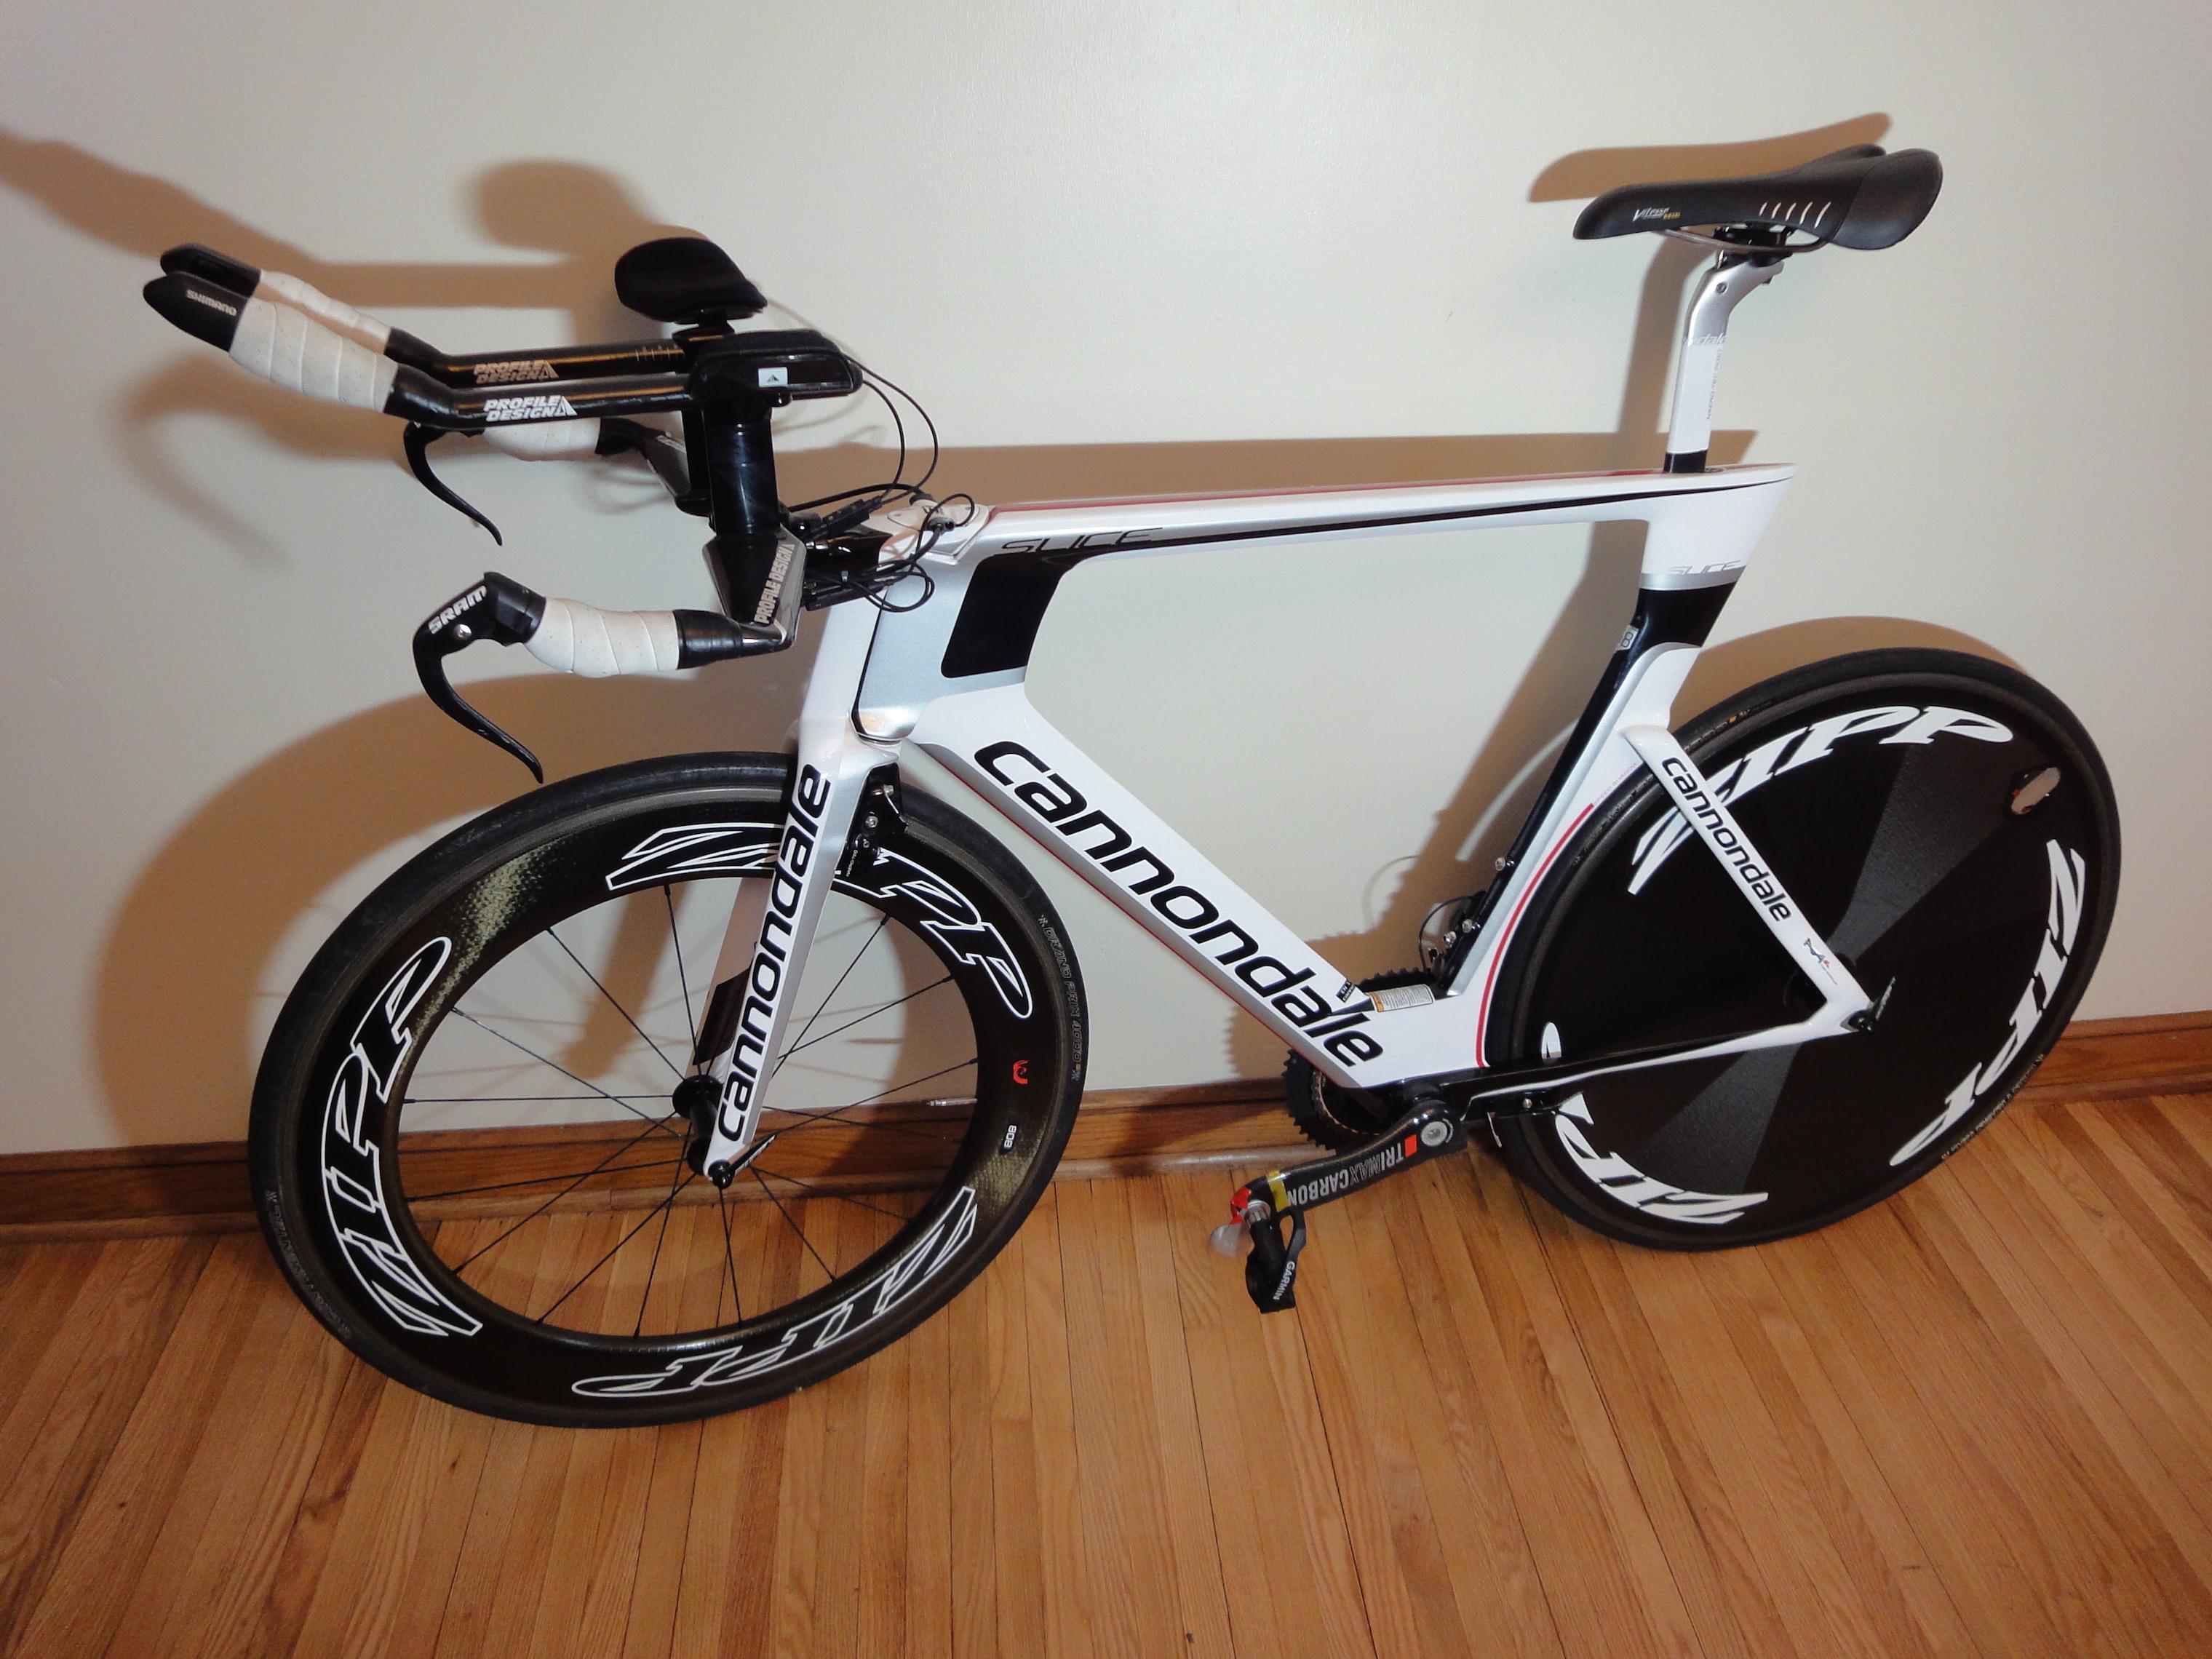 d46e0d07280 Bike details. Marketplace   Cannondale Slice RS Hi-MOD Ultegra Di2